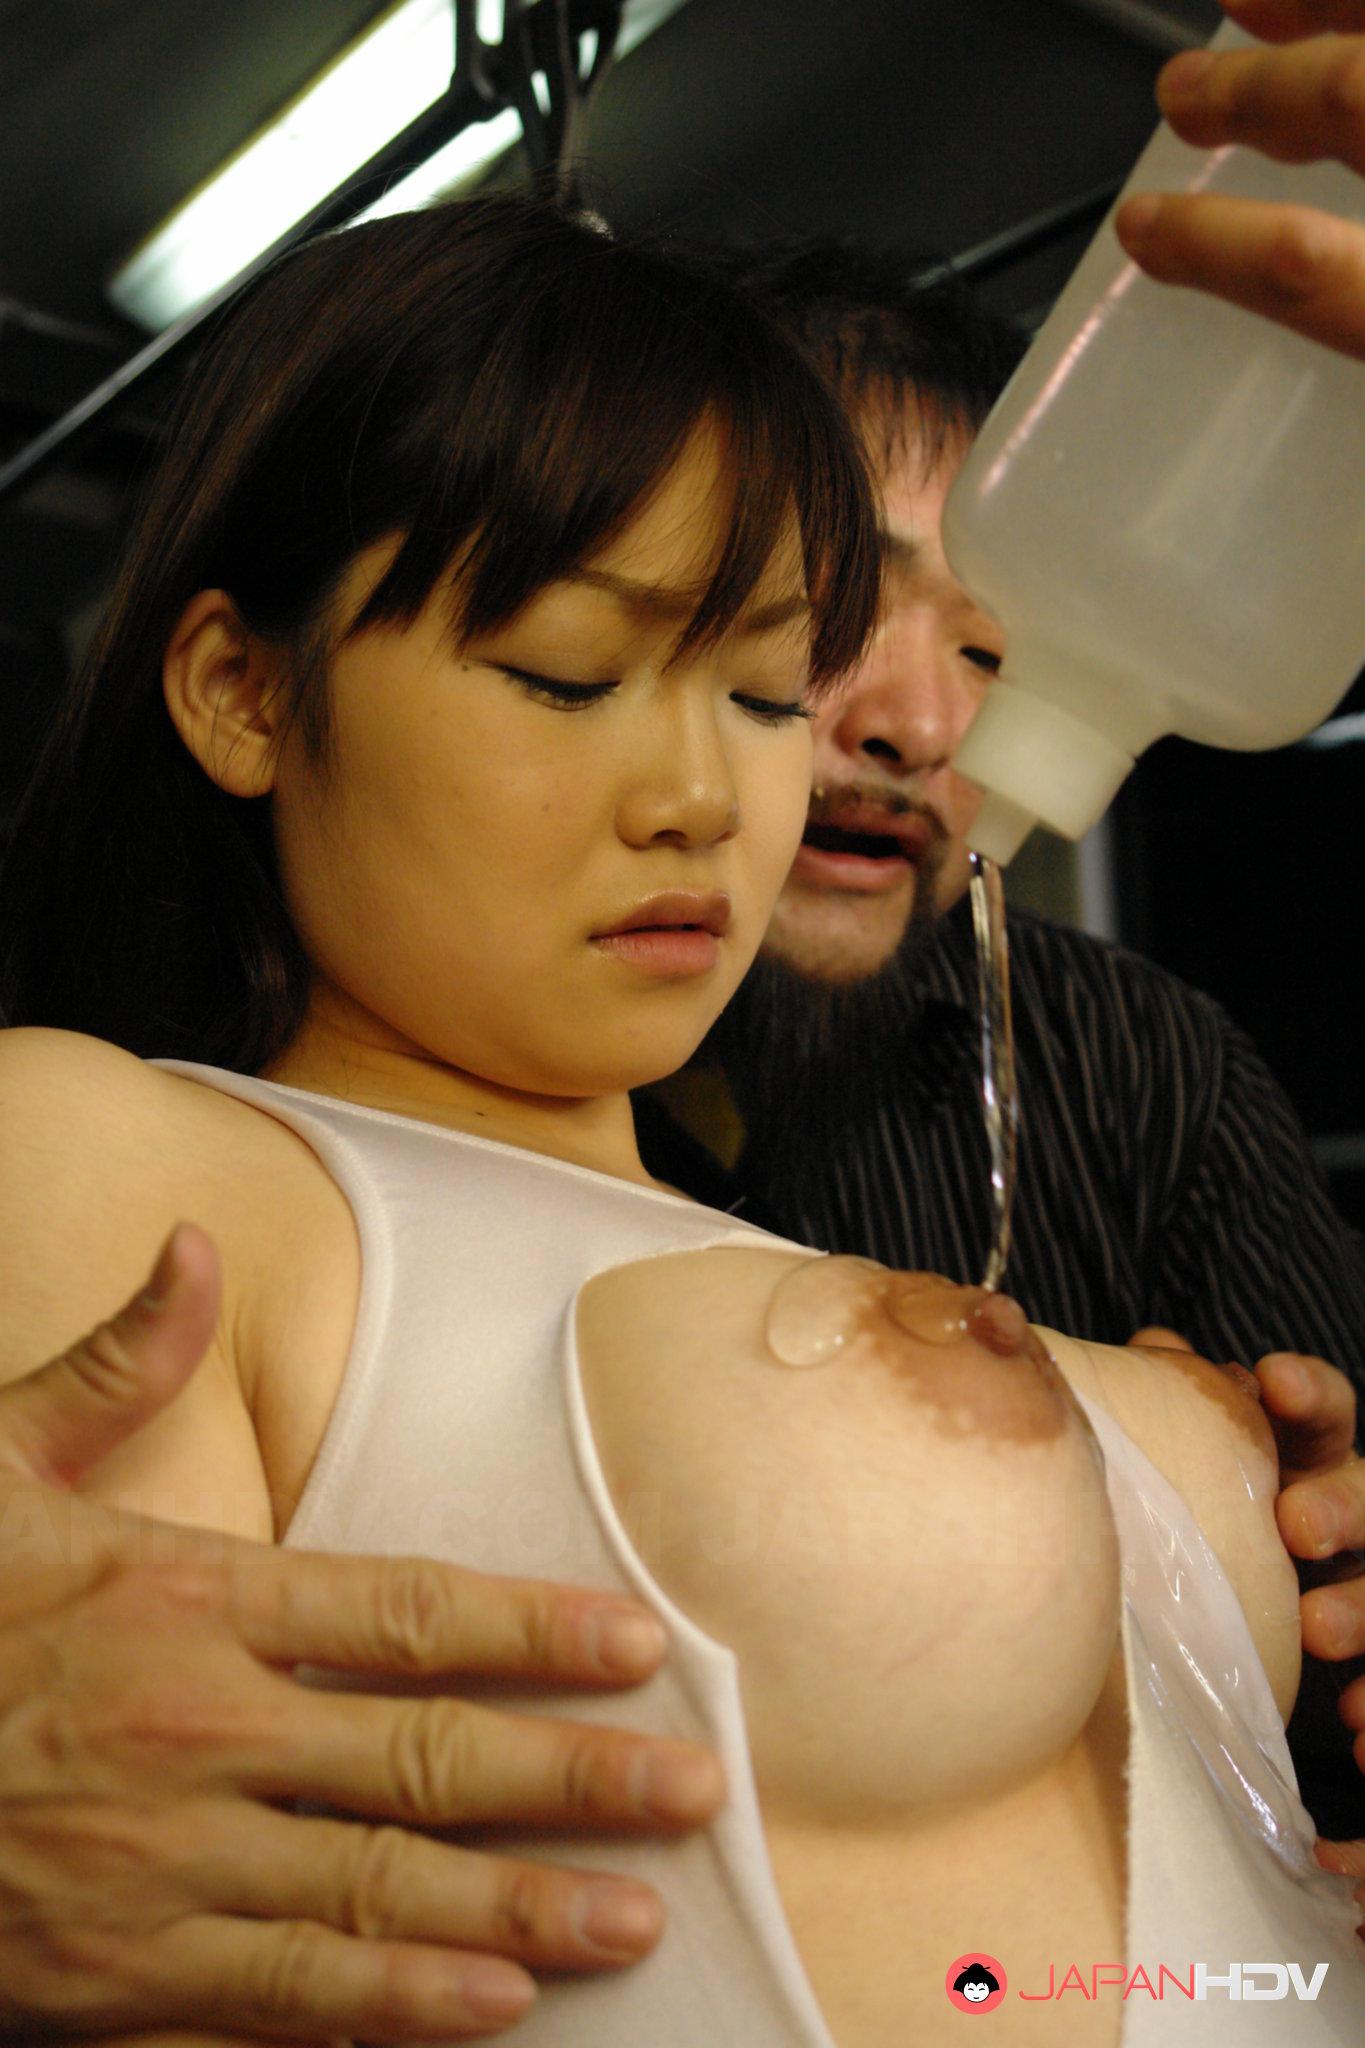 Japan hot bus porn